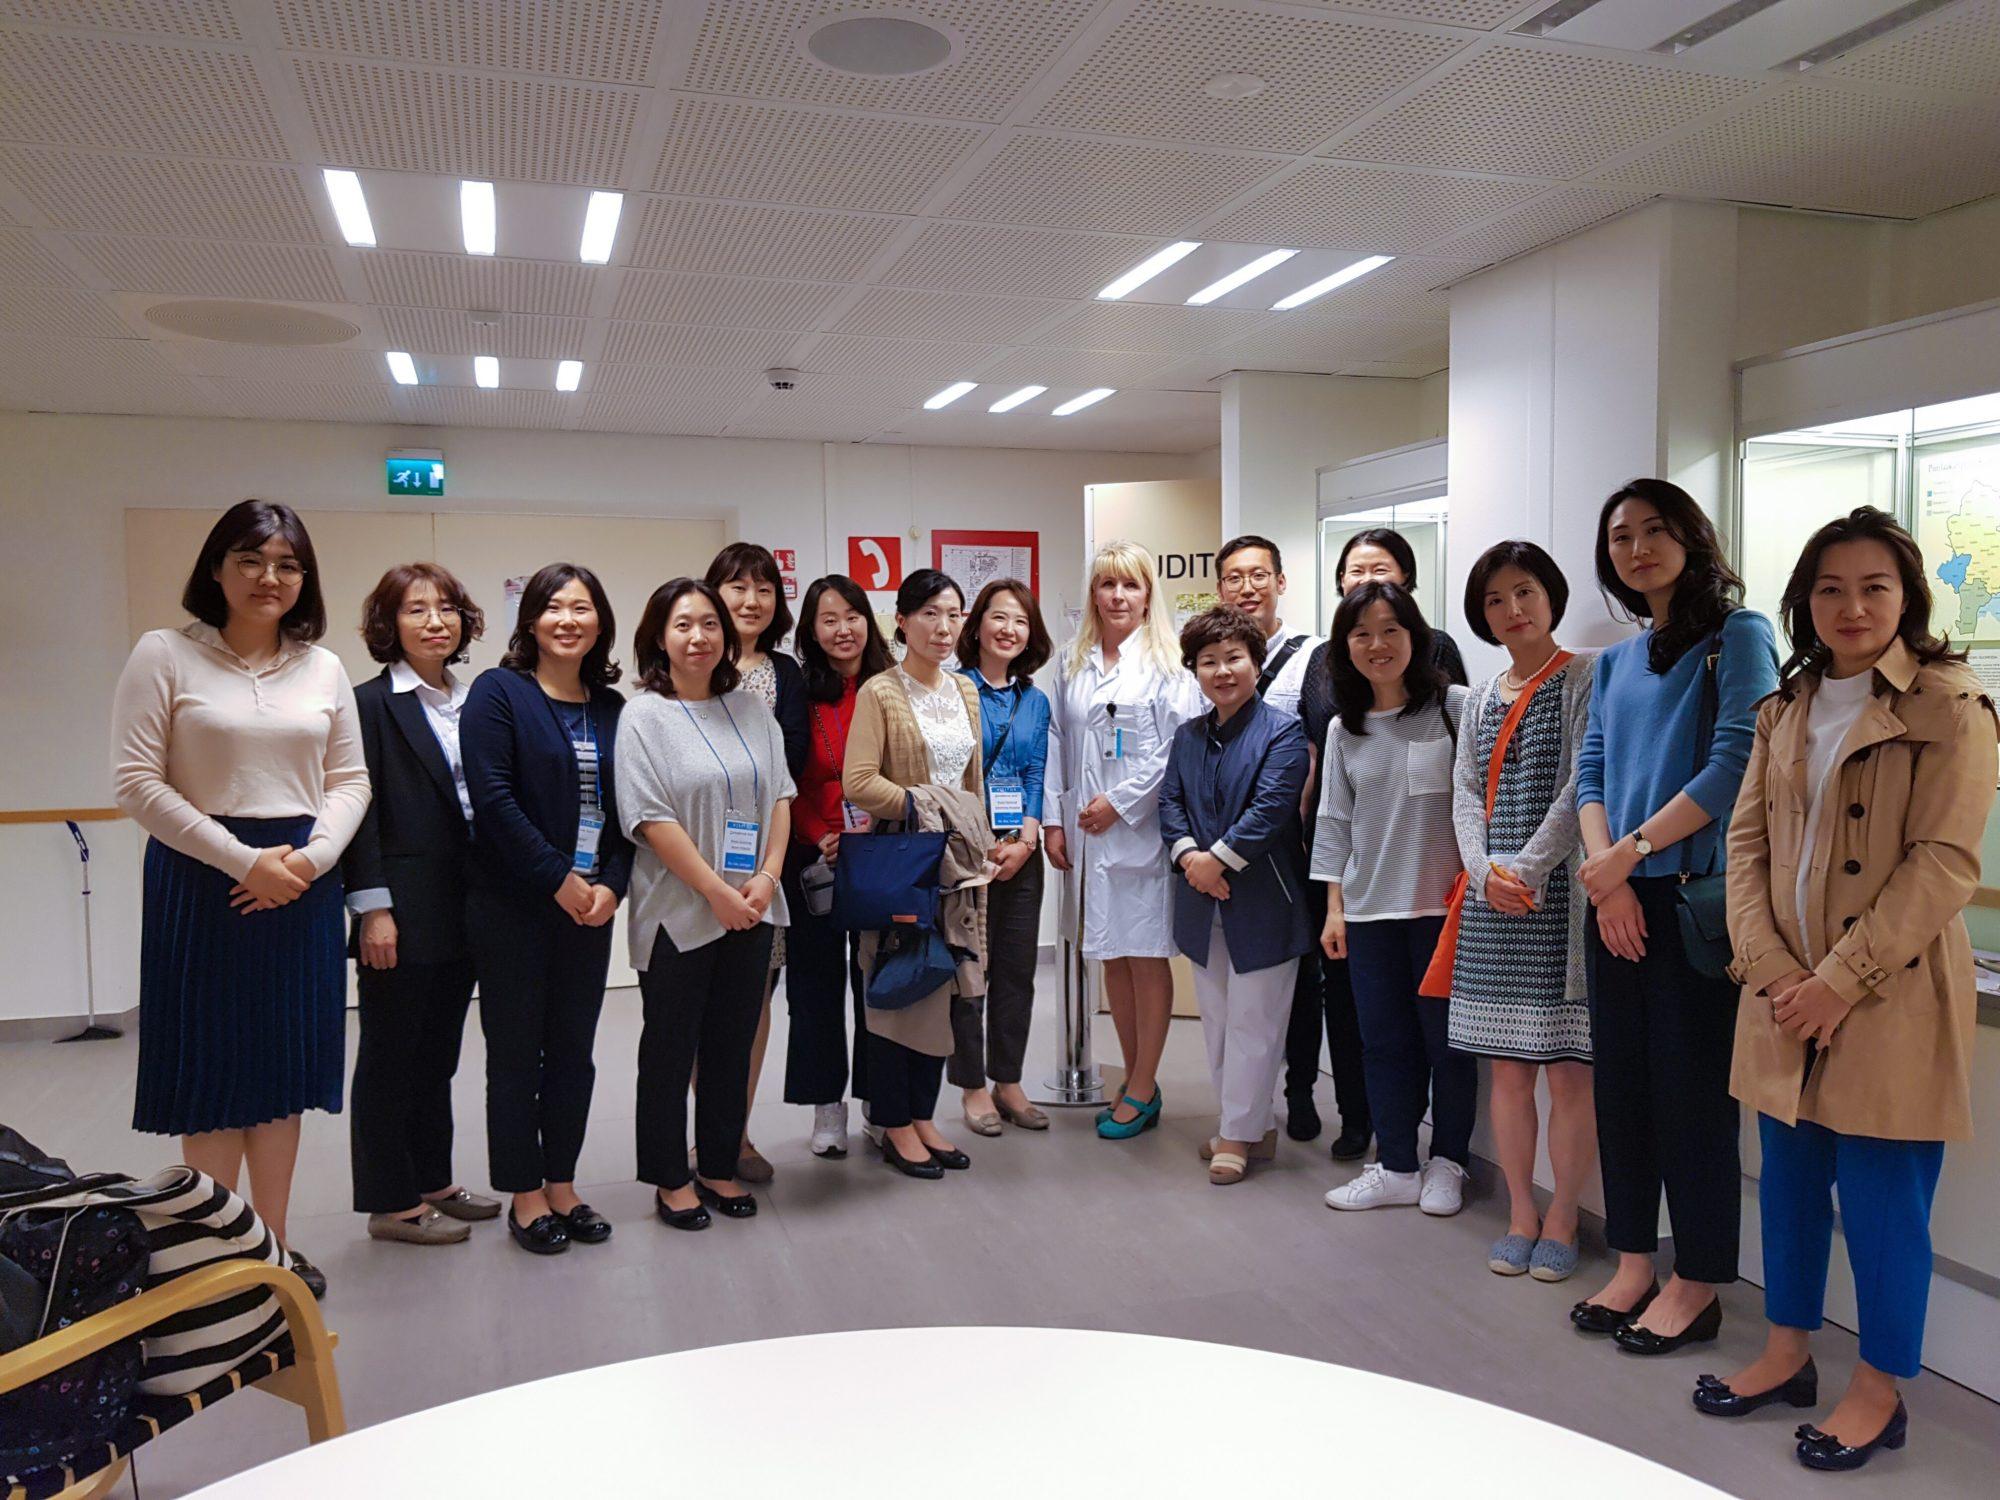 Korean hospital industry delegation in Finland